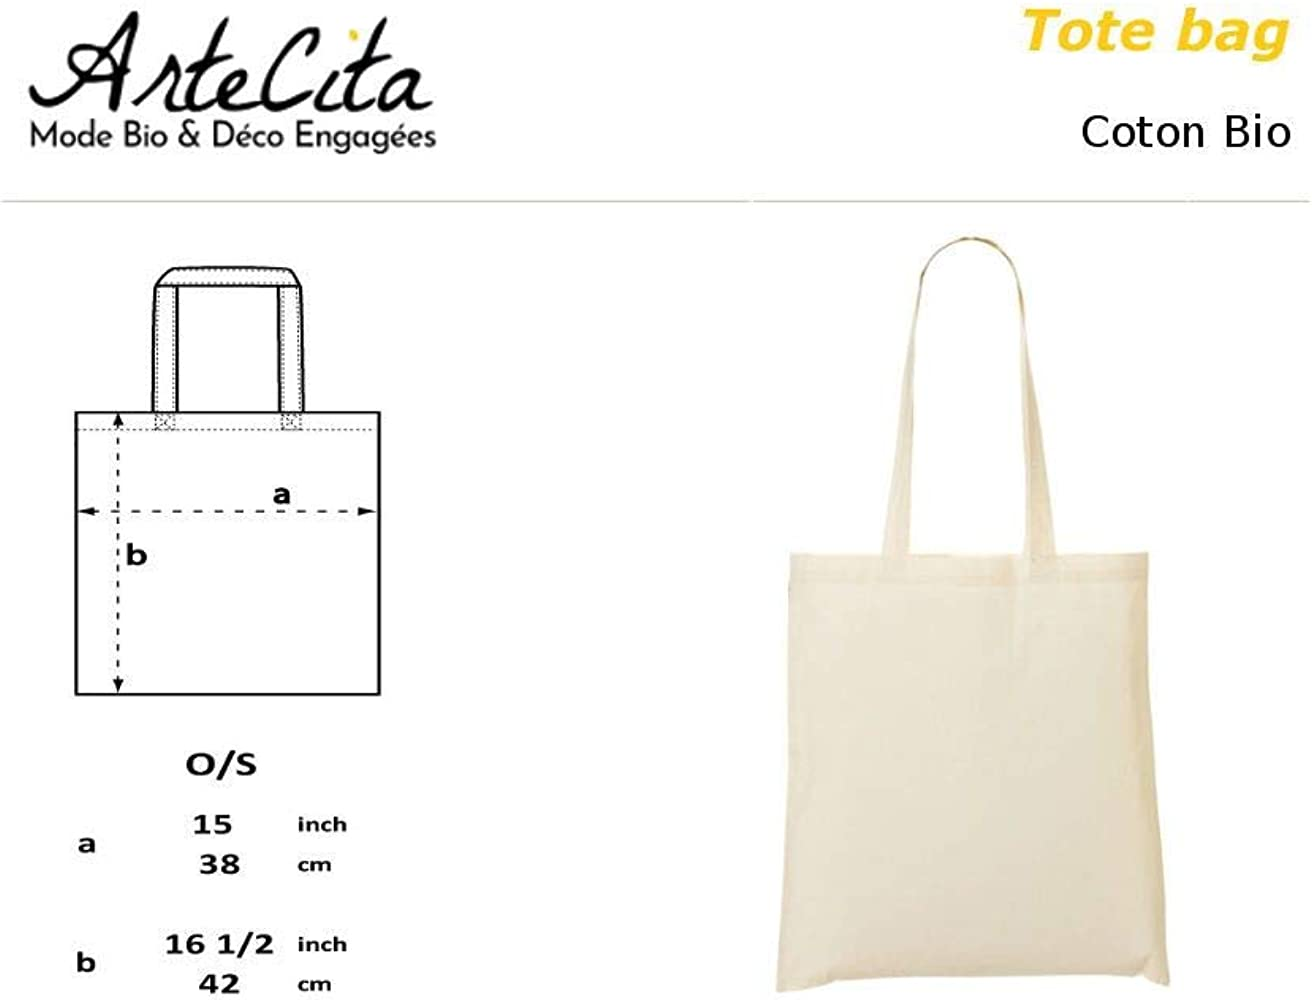 ArteCita Tote Bag - Bolsa de algodón orgánico, diseño con texto Je ...